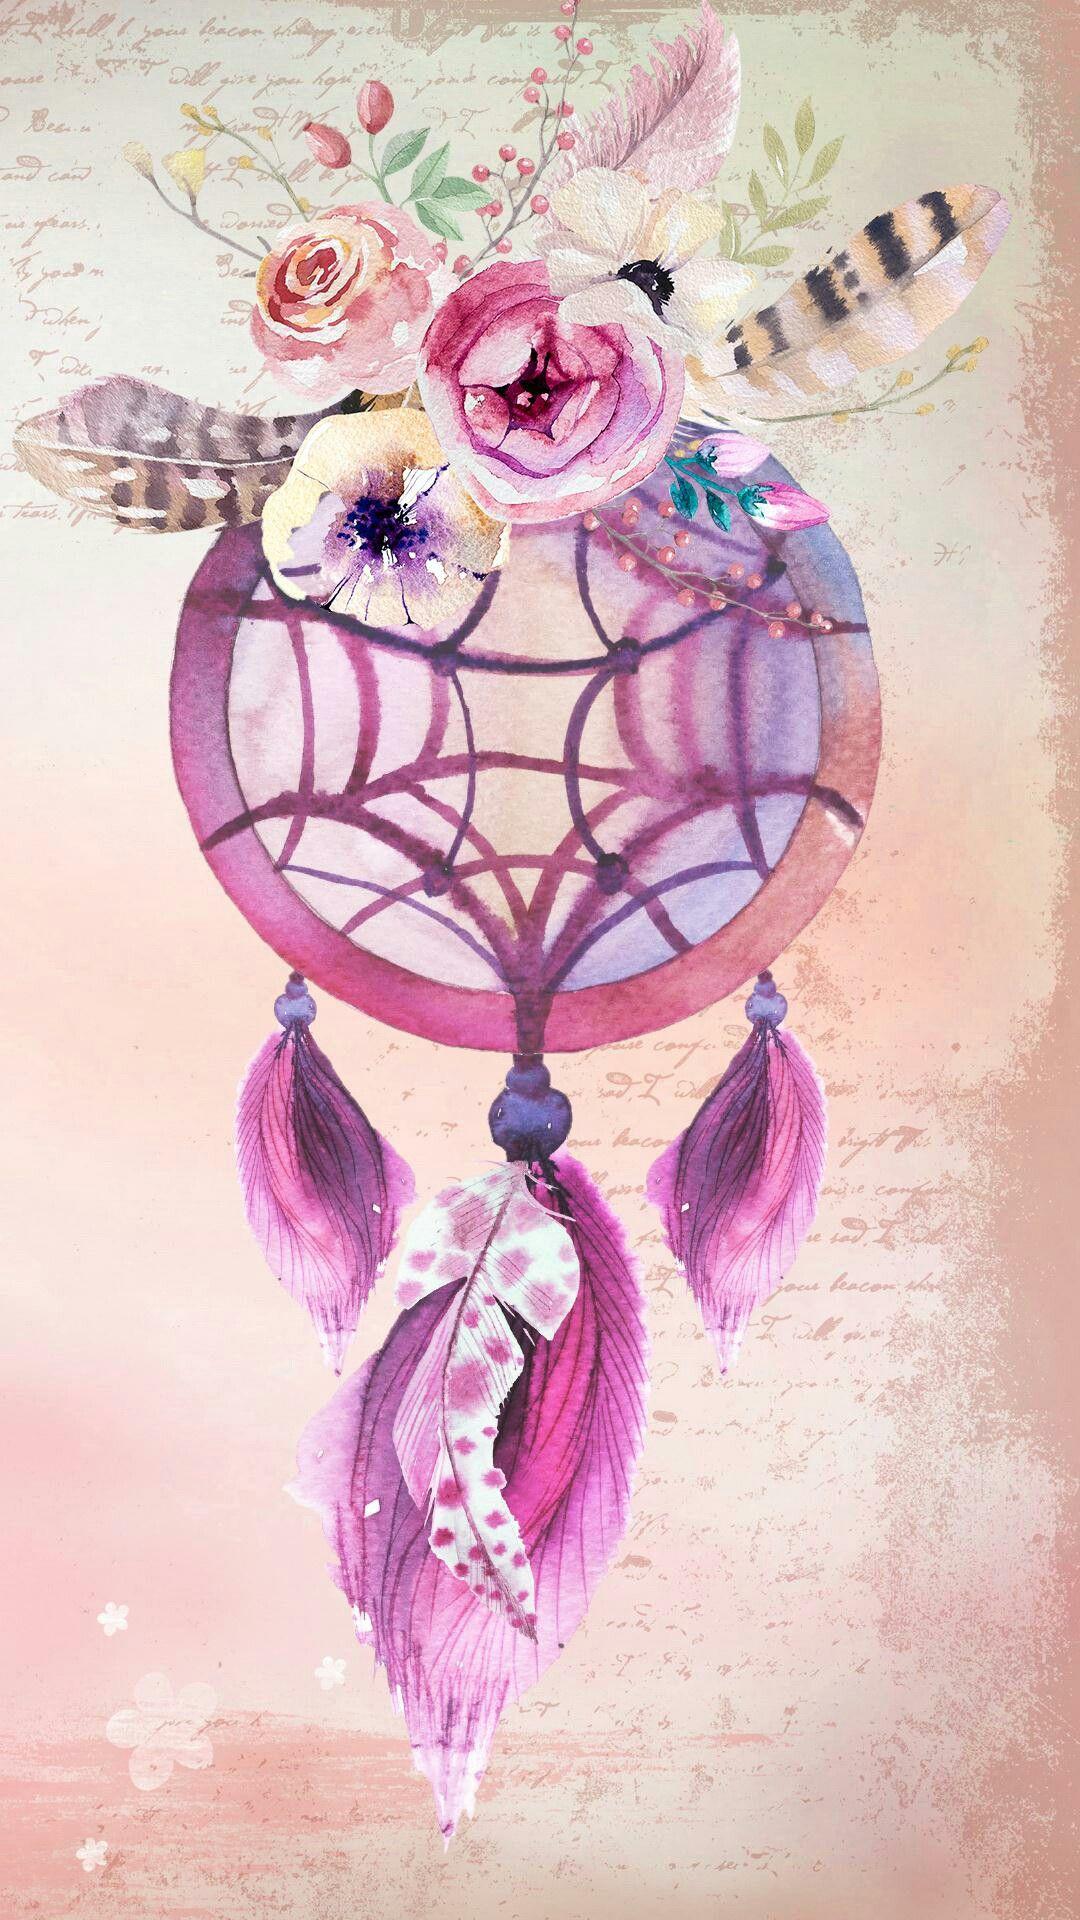 Wonderful Wallpaper Girly Ipod 5 - 5233969d35b8a38ba6421a0508e735cd  Pic_383514 .jpg